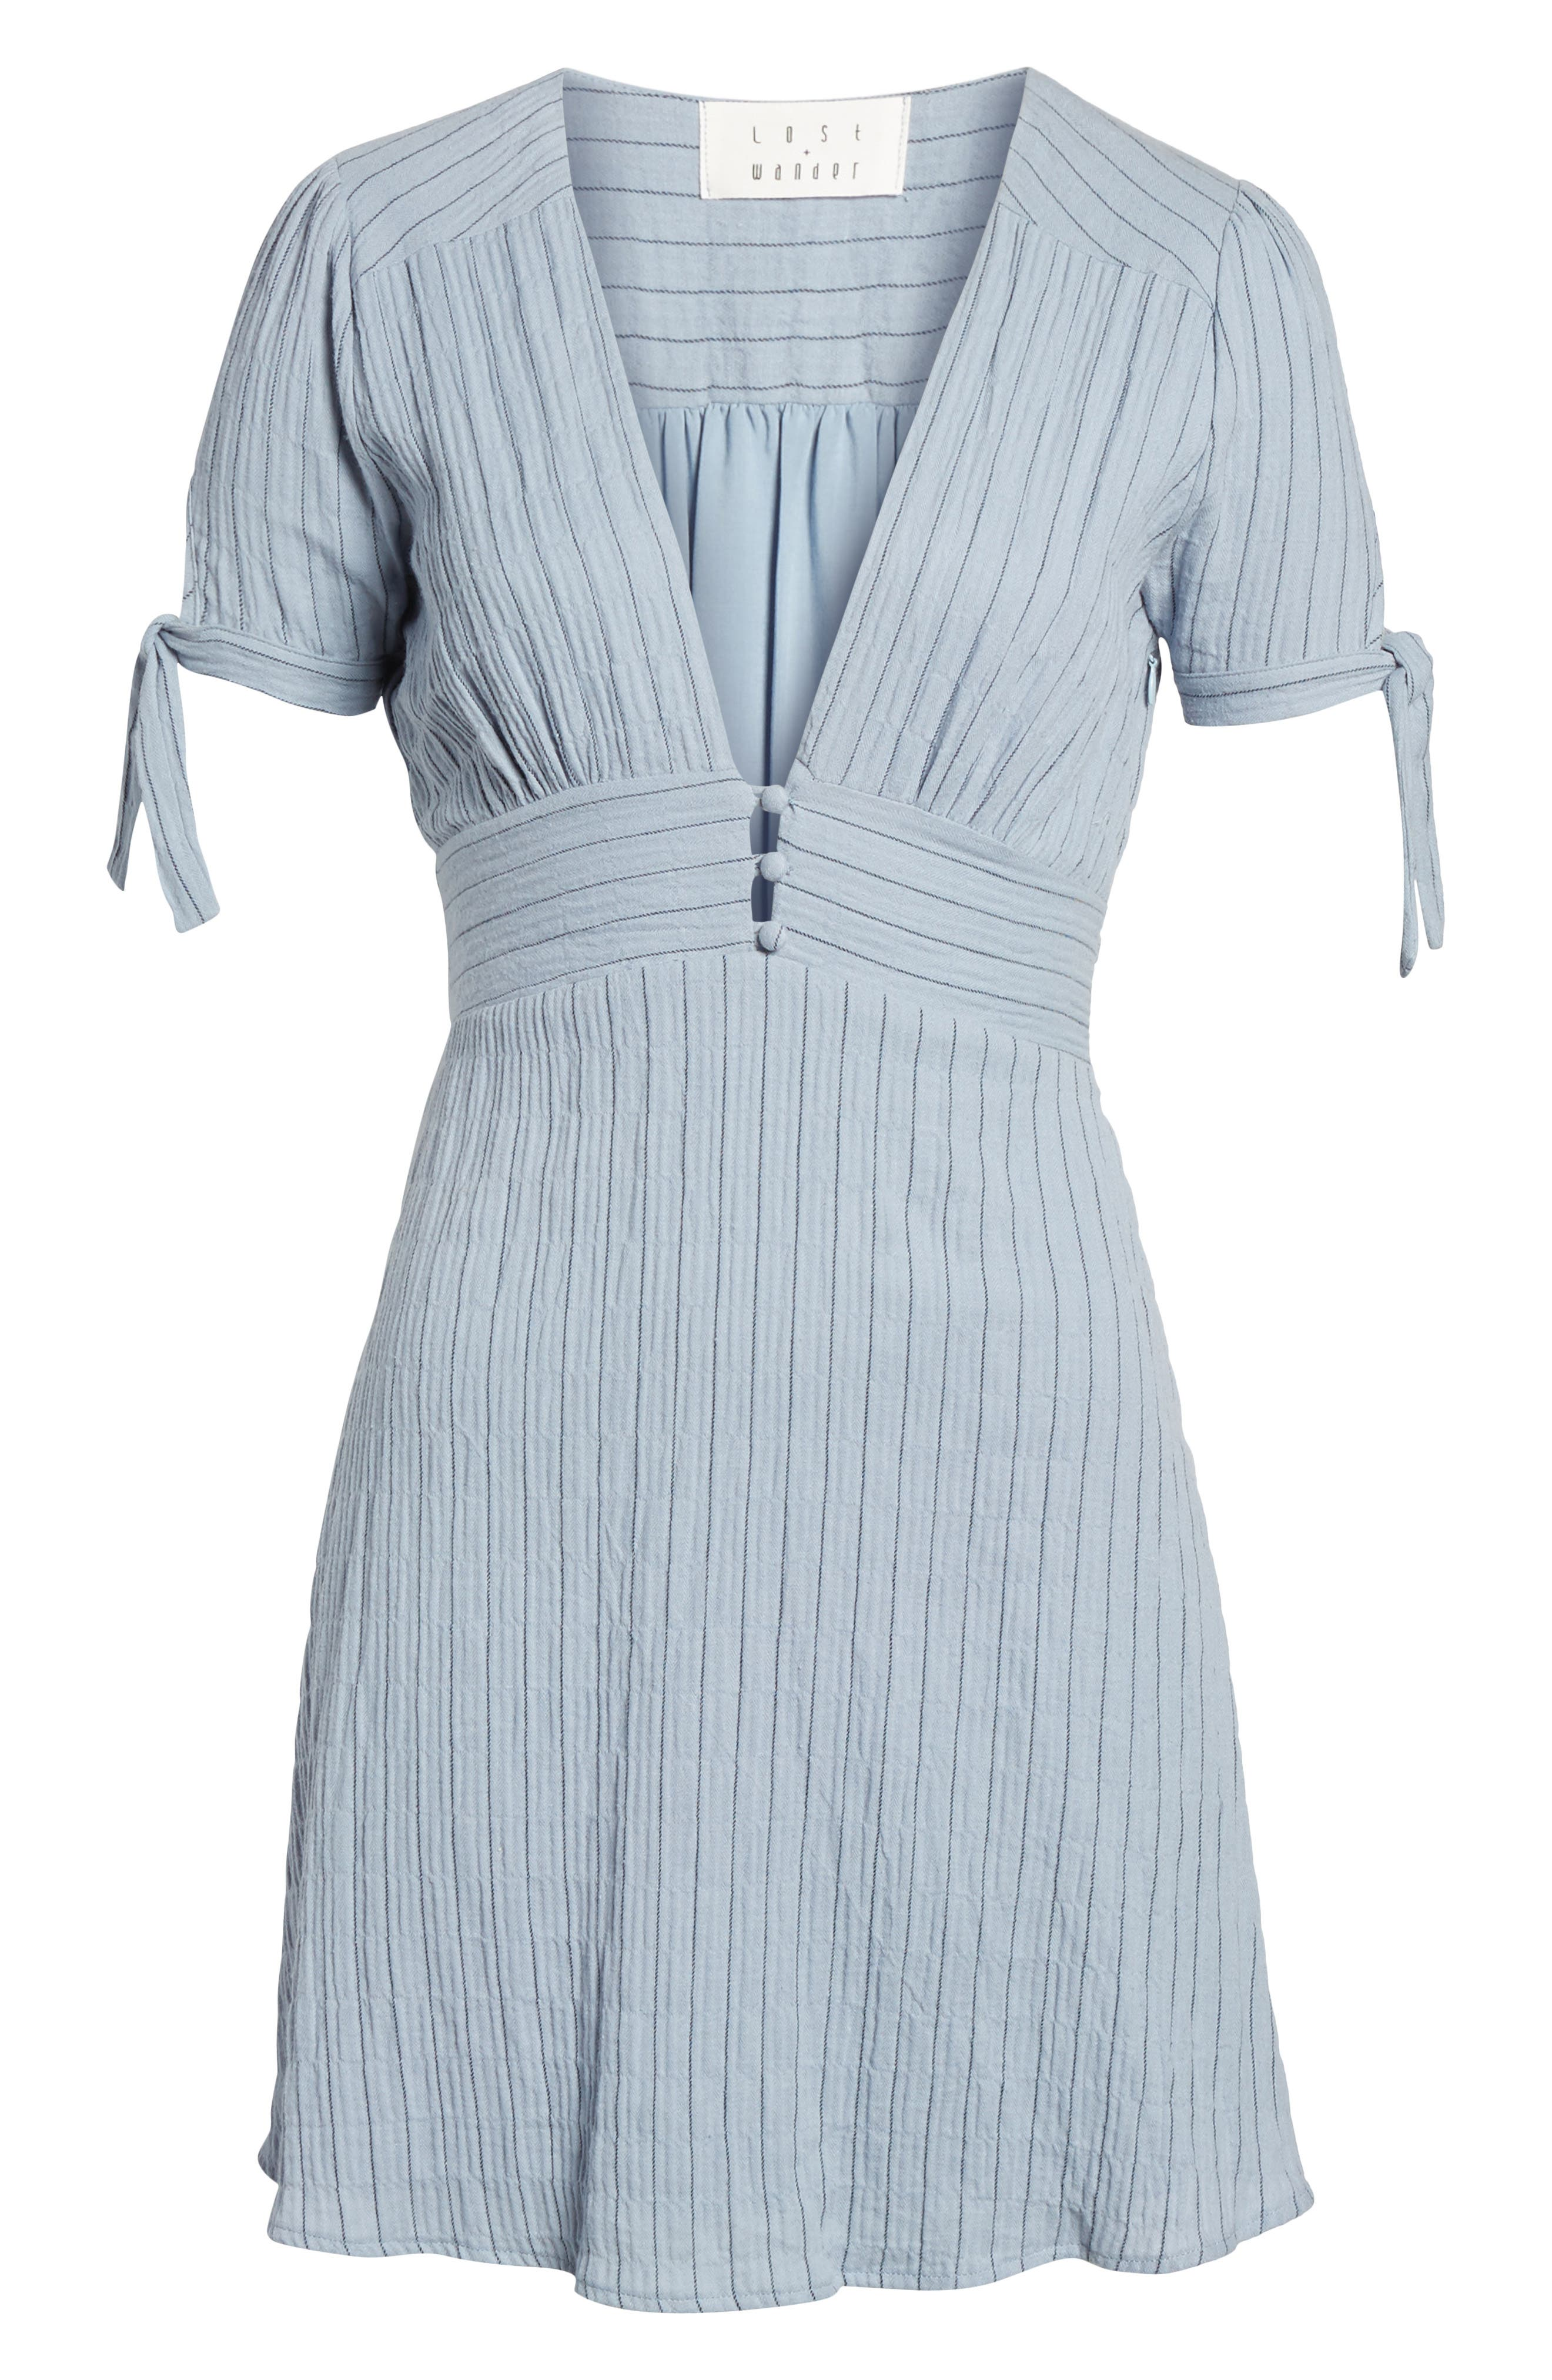 Sky Stripe Tie Sleeve Dress,                             Alternate thumbnail 7, color,                             Blue